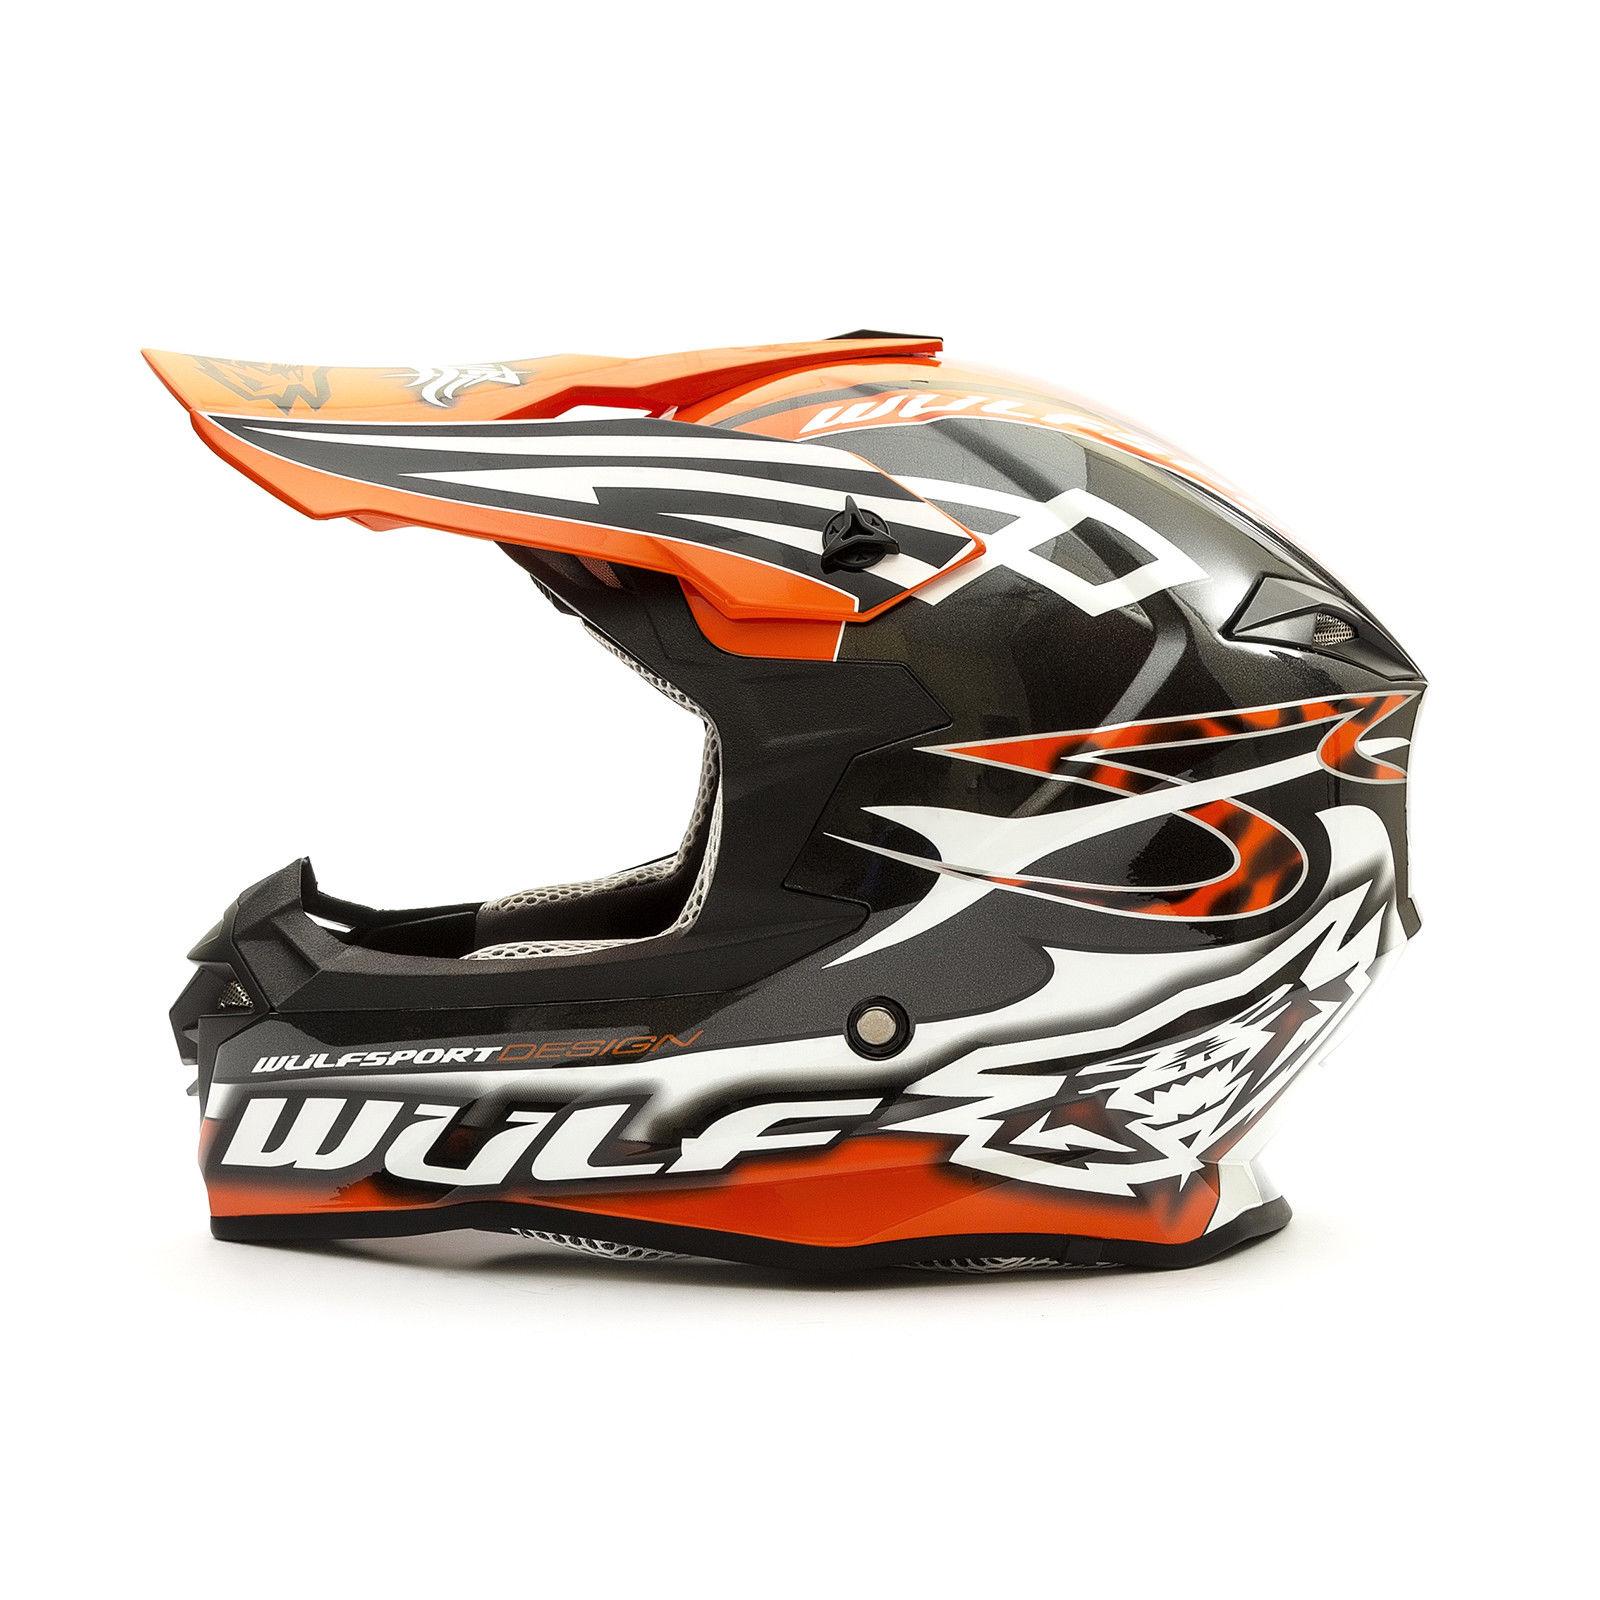 Wulfsport-Adult-Sceptre-Helmets-Motocross-Pitbike-Motorbike-Off-Road-Racing-ATV thumbnail 83